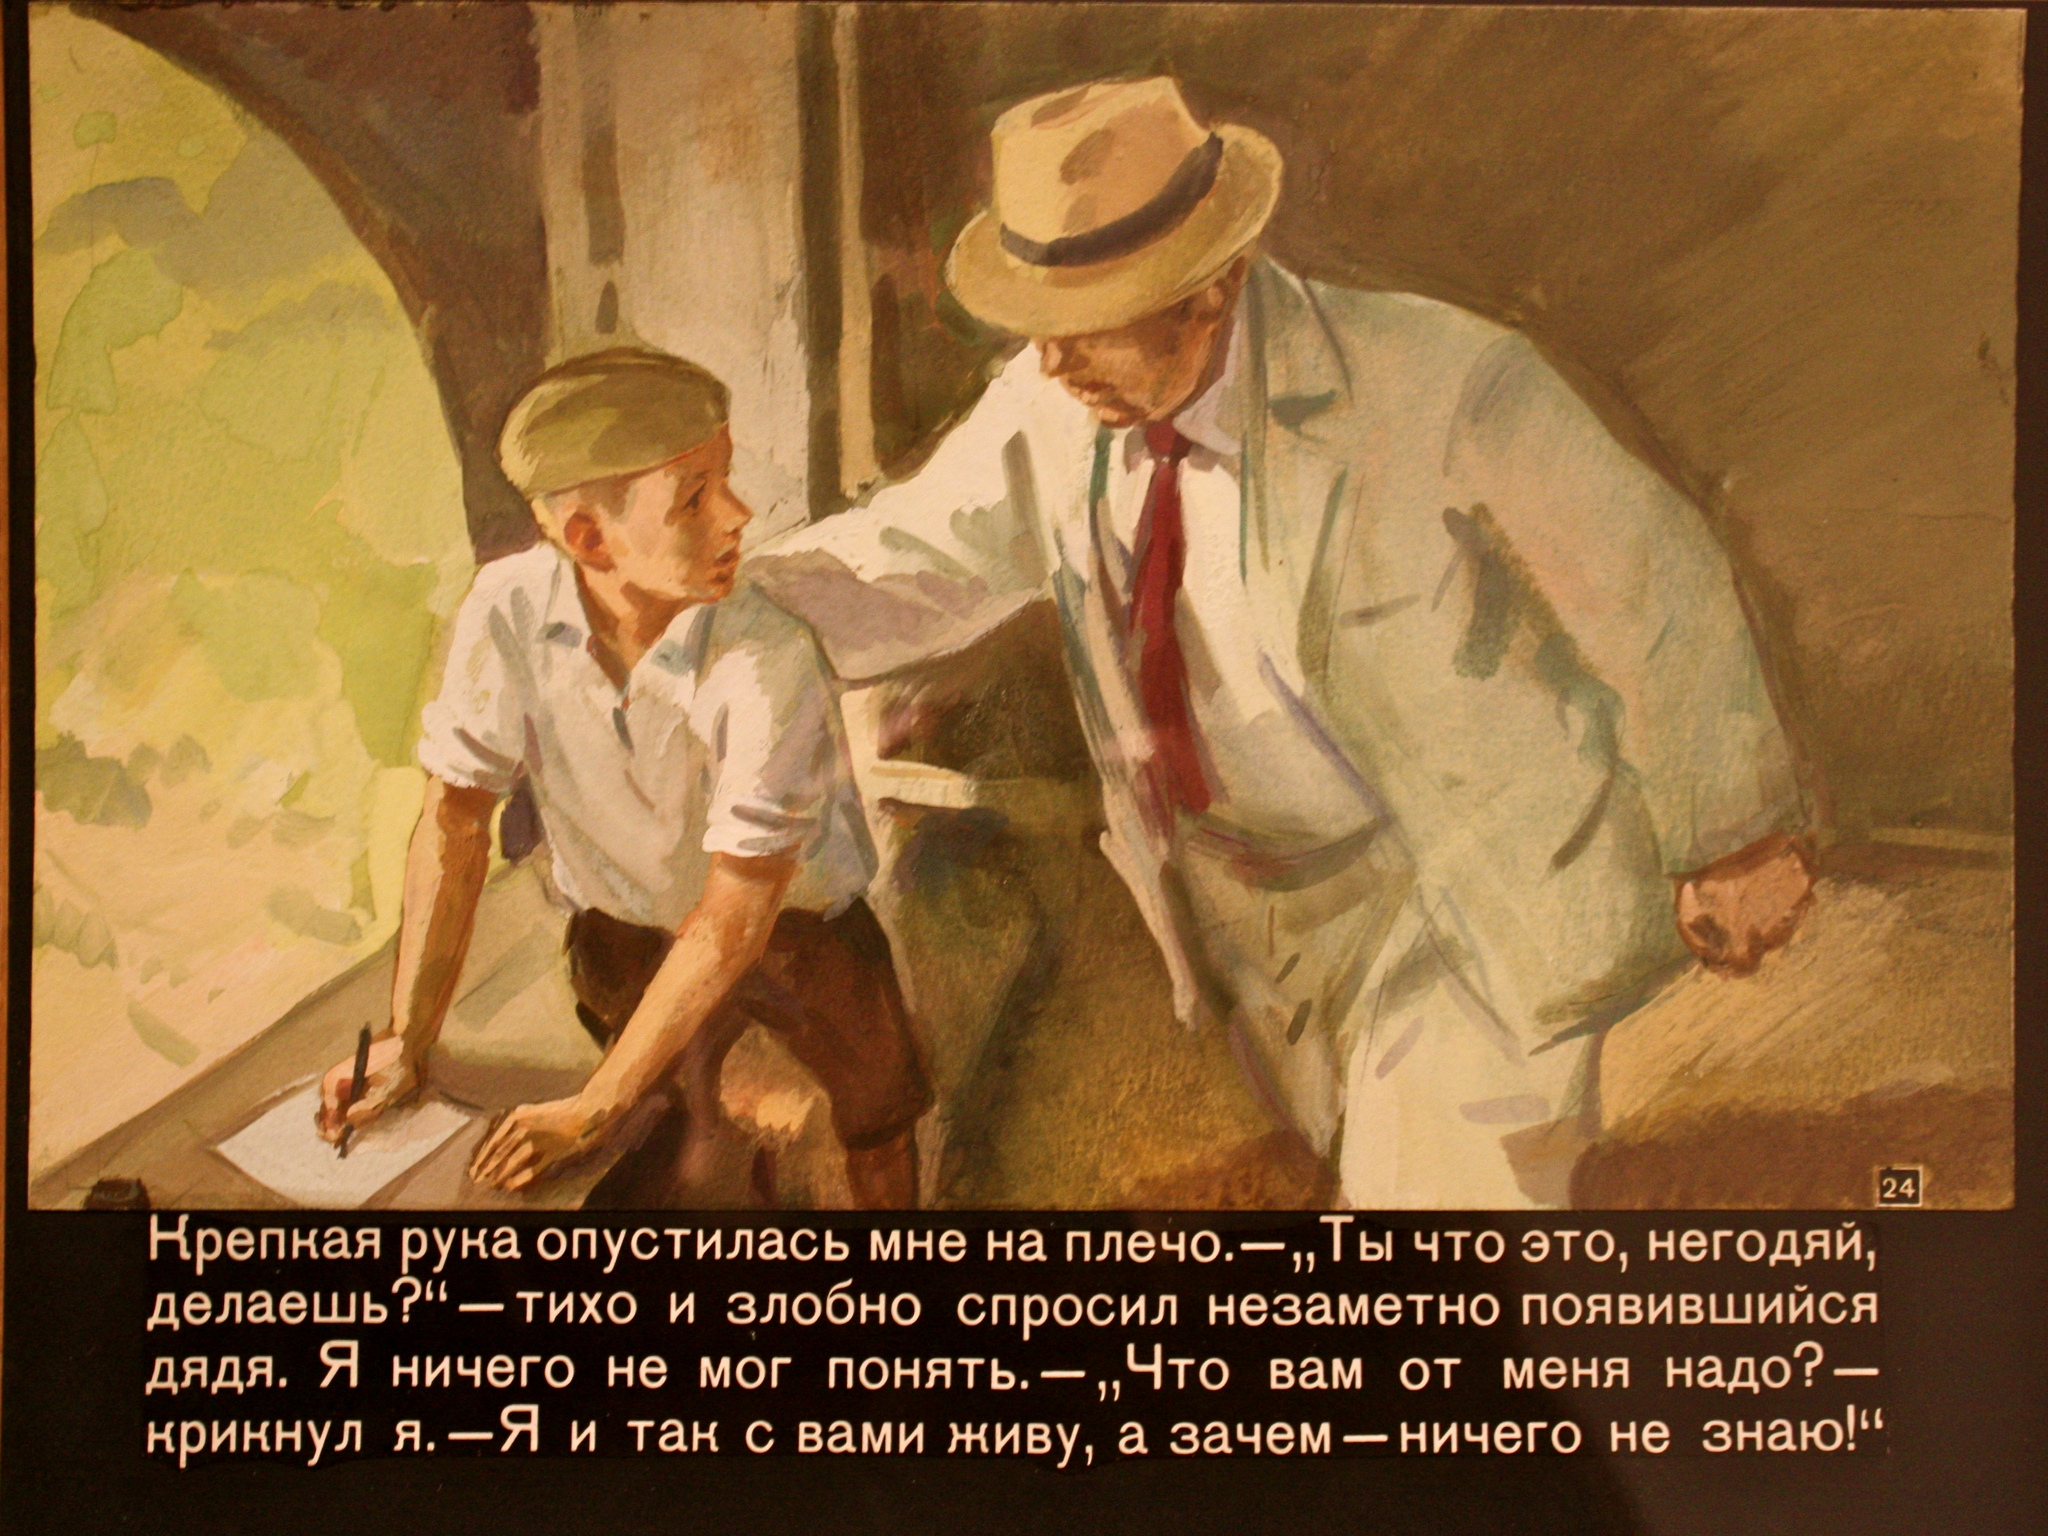 annotatsiya-k-filmu-goliy-barabanshik